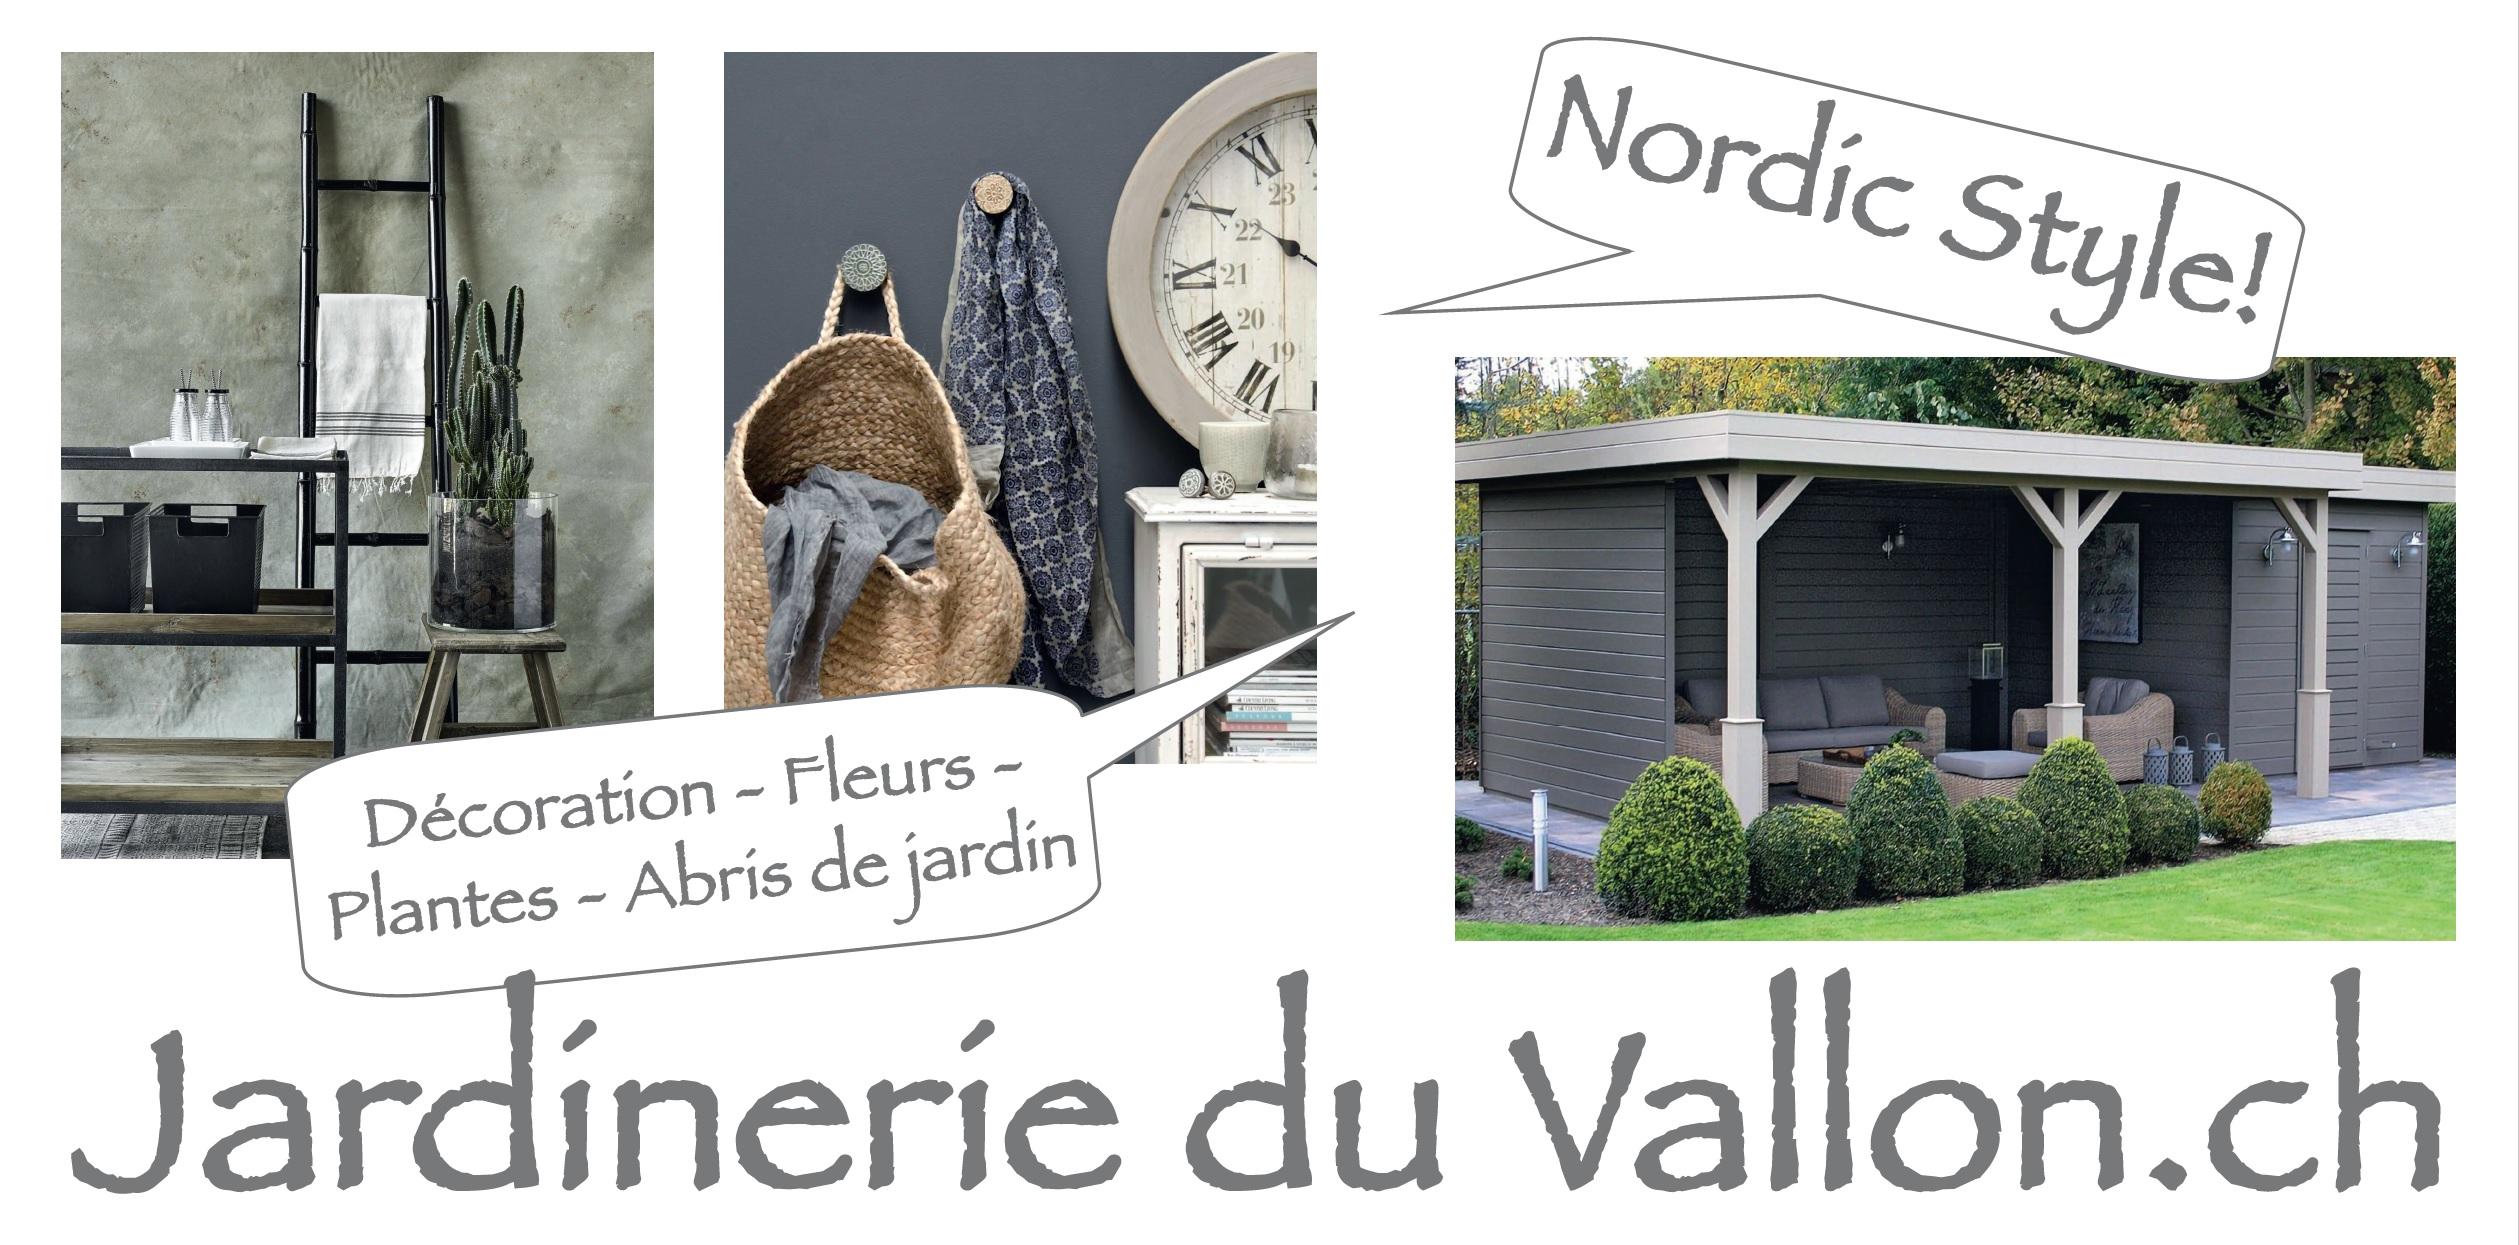 Jardinerie du Vallon